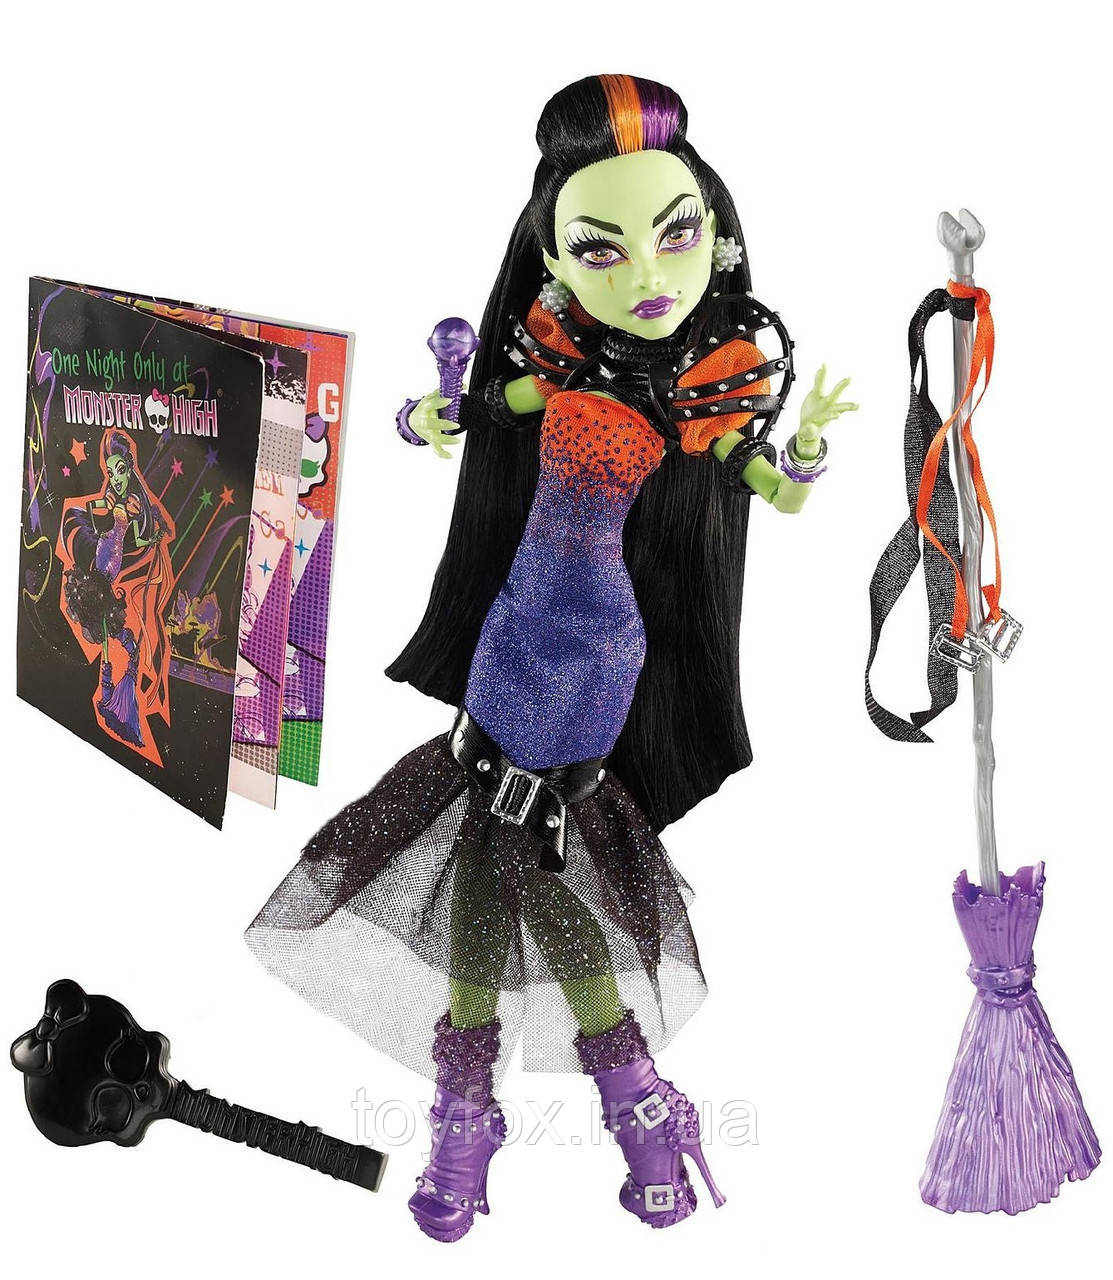 Ляльки Монстер Хай Базові - Monster High Basic